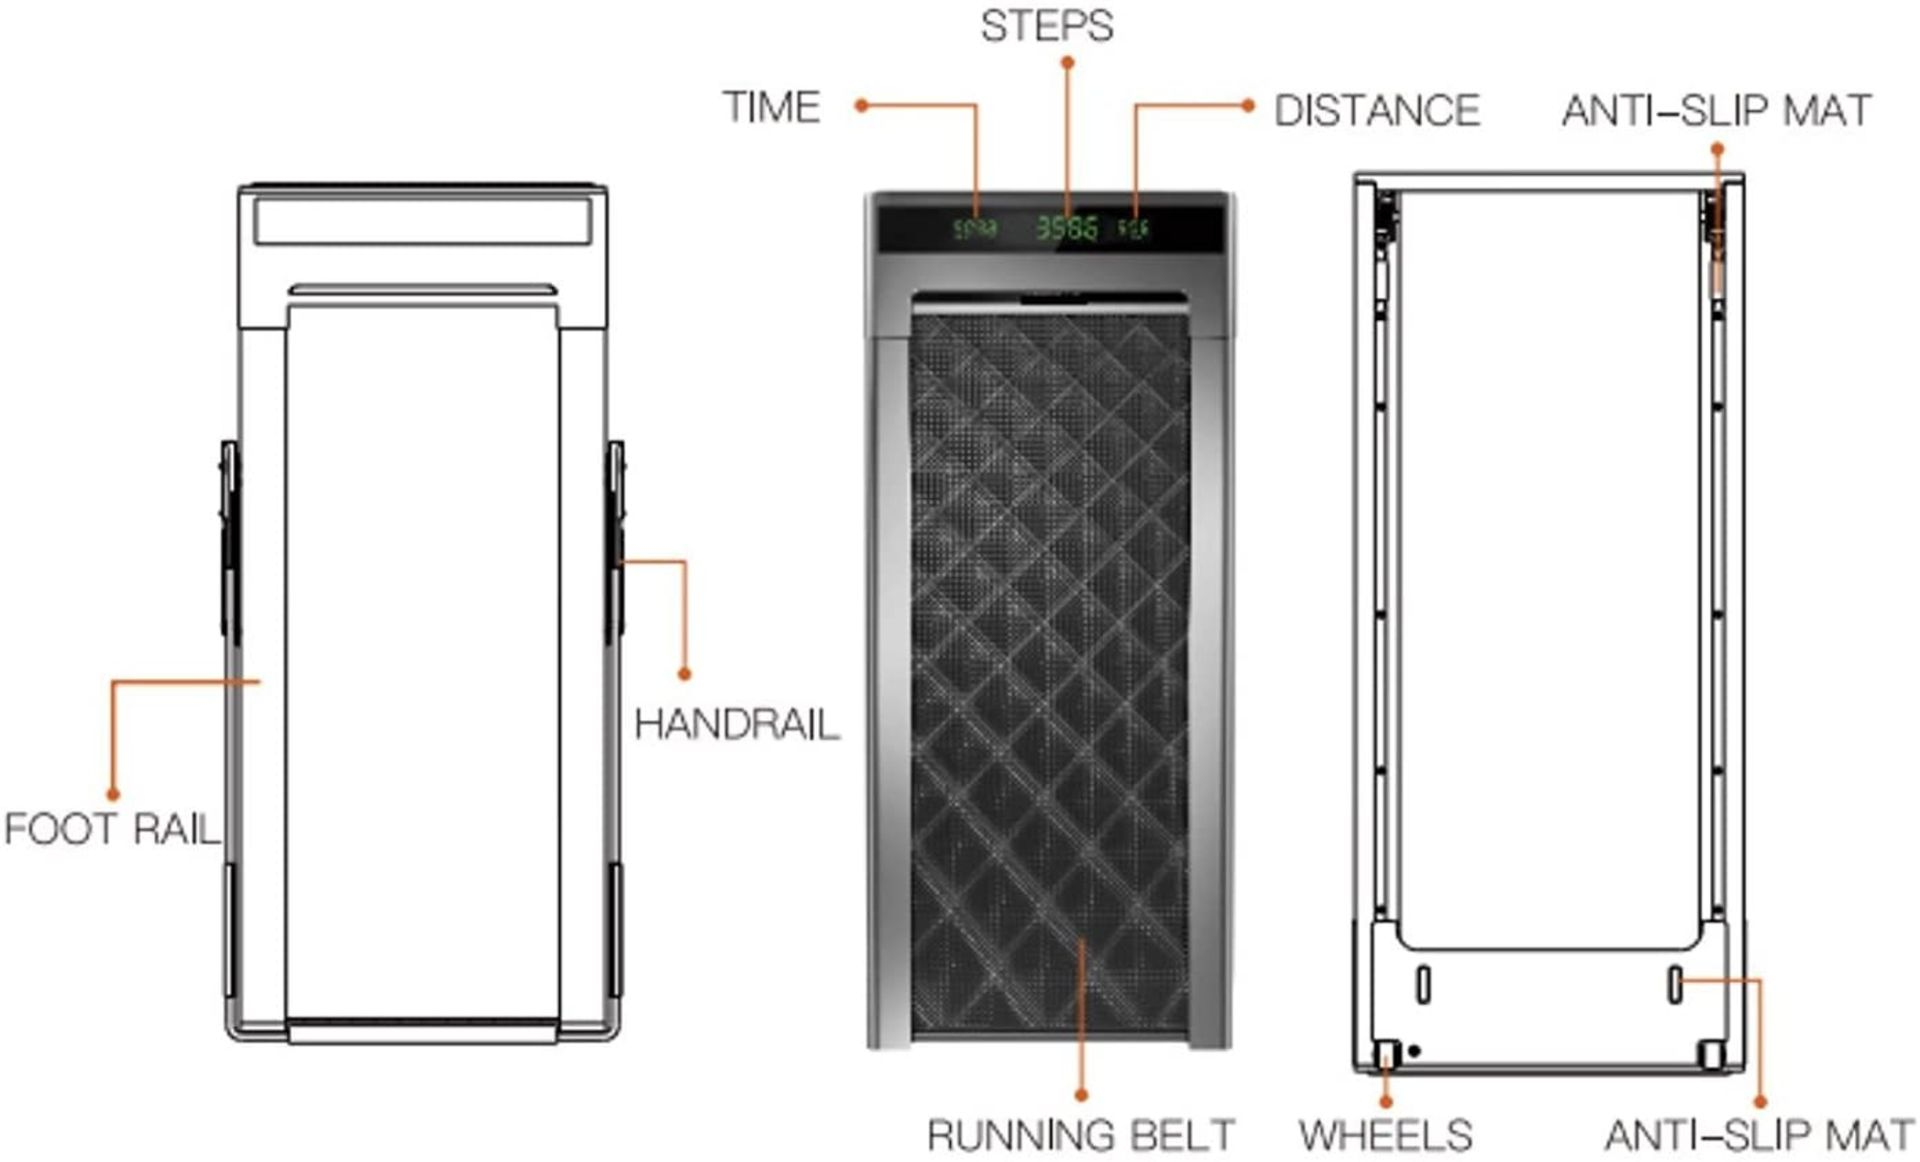 1 x Slim Tread Ultra Thin Smart Treadmill Running / Walking Machine - Lightweight With Folding - Image 12 of 23